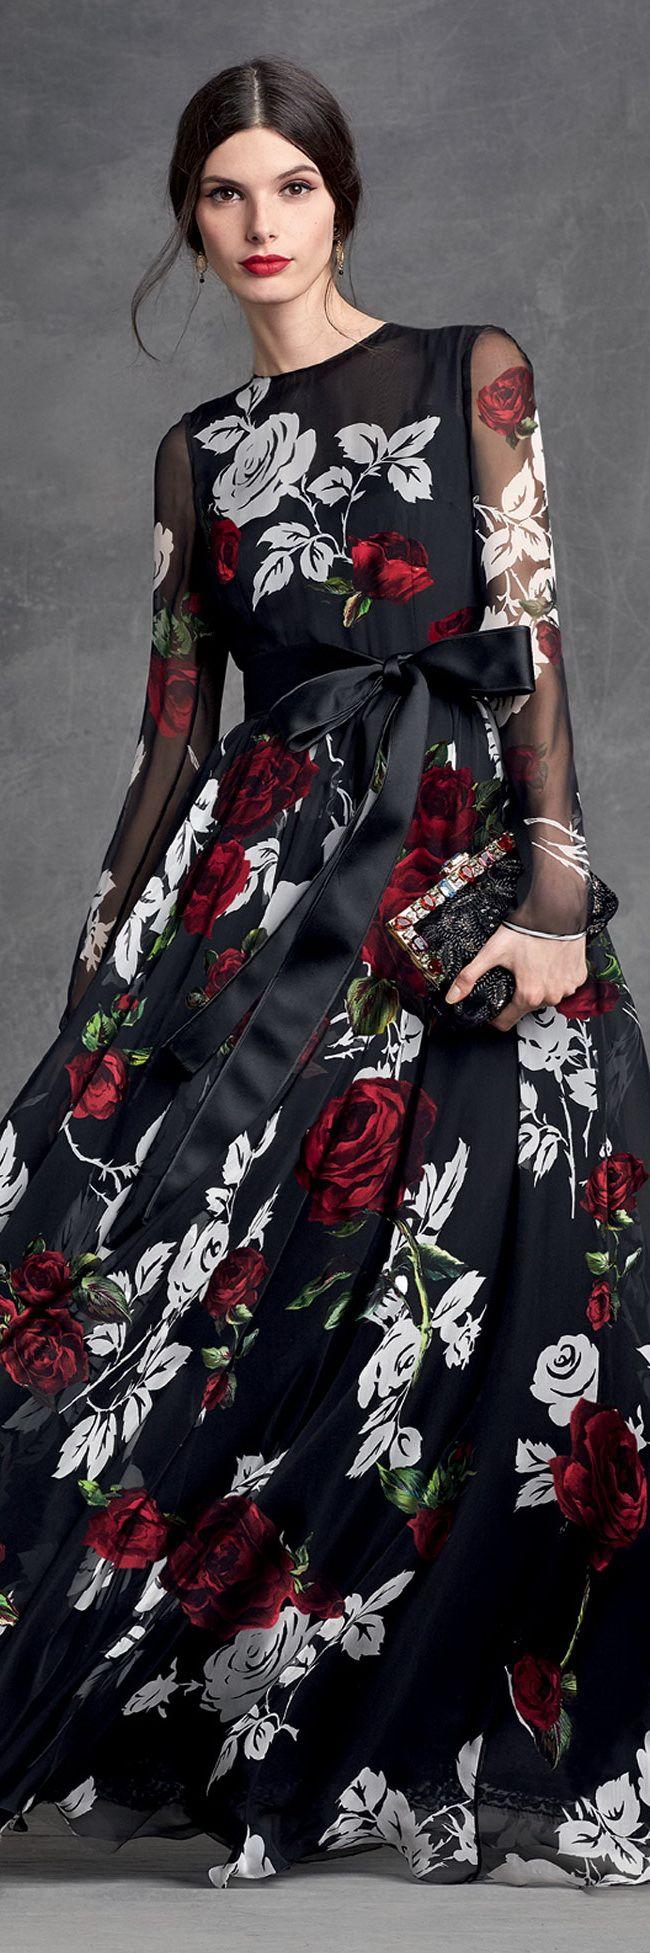 Dolce & Gabbana, Winter 2016.                                                                                                                                                                                 More